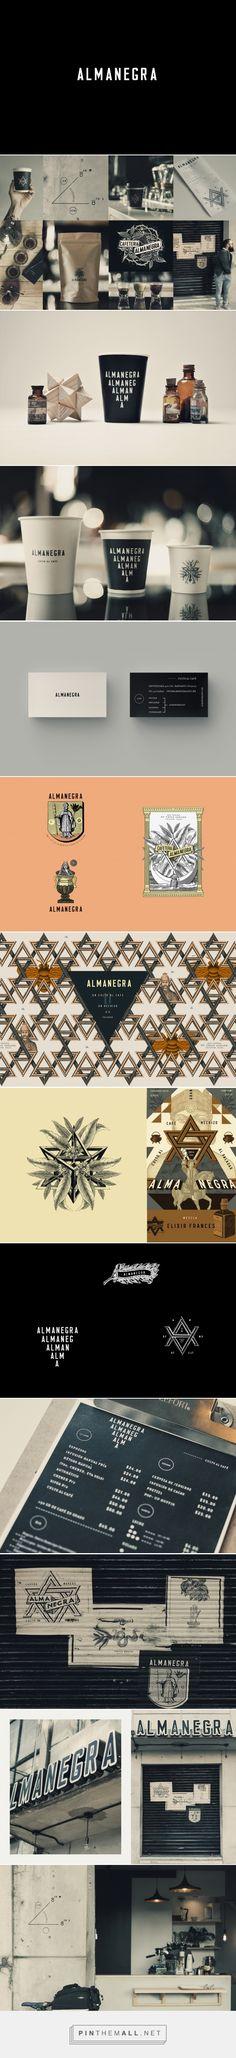 Almanegra - Estudio Yeyé ® Smart & Beautyy http://jrstudioweb.com/diseno-grafico/diseno-de-logotipos/